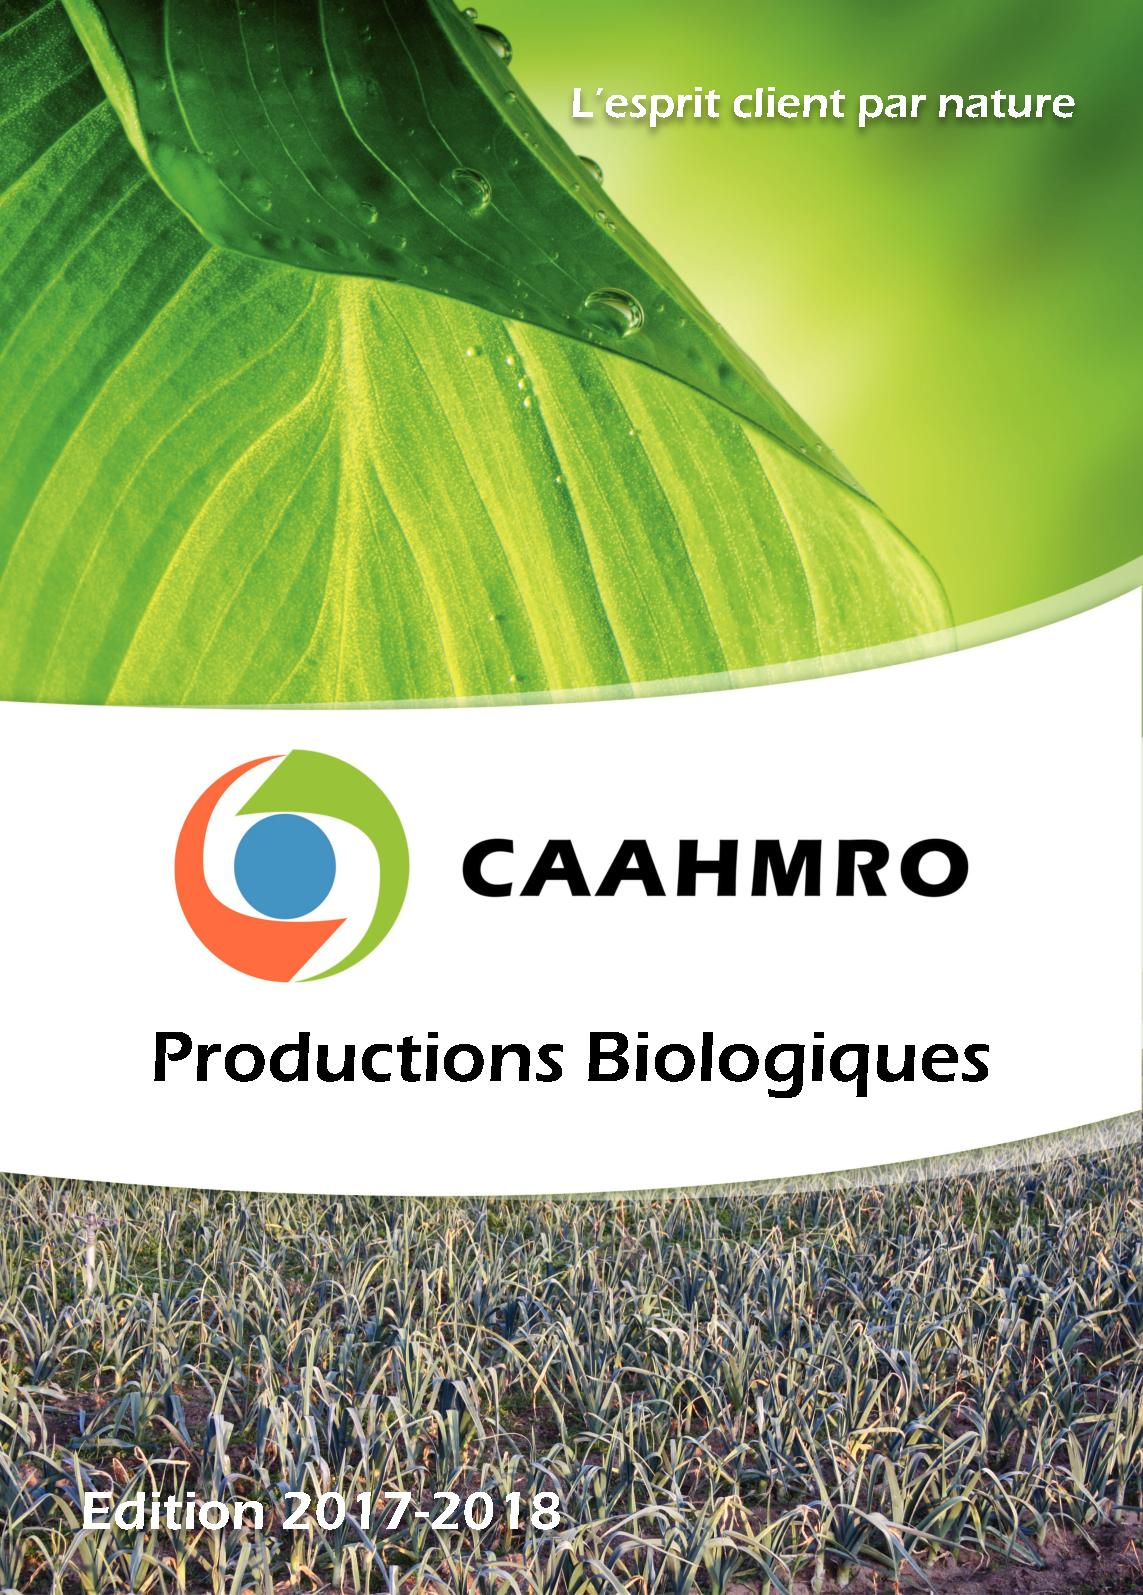 Catalogue Bio 2017-2018